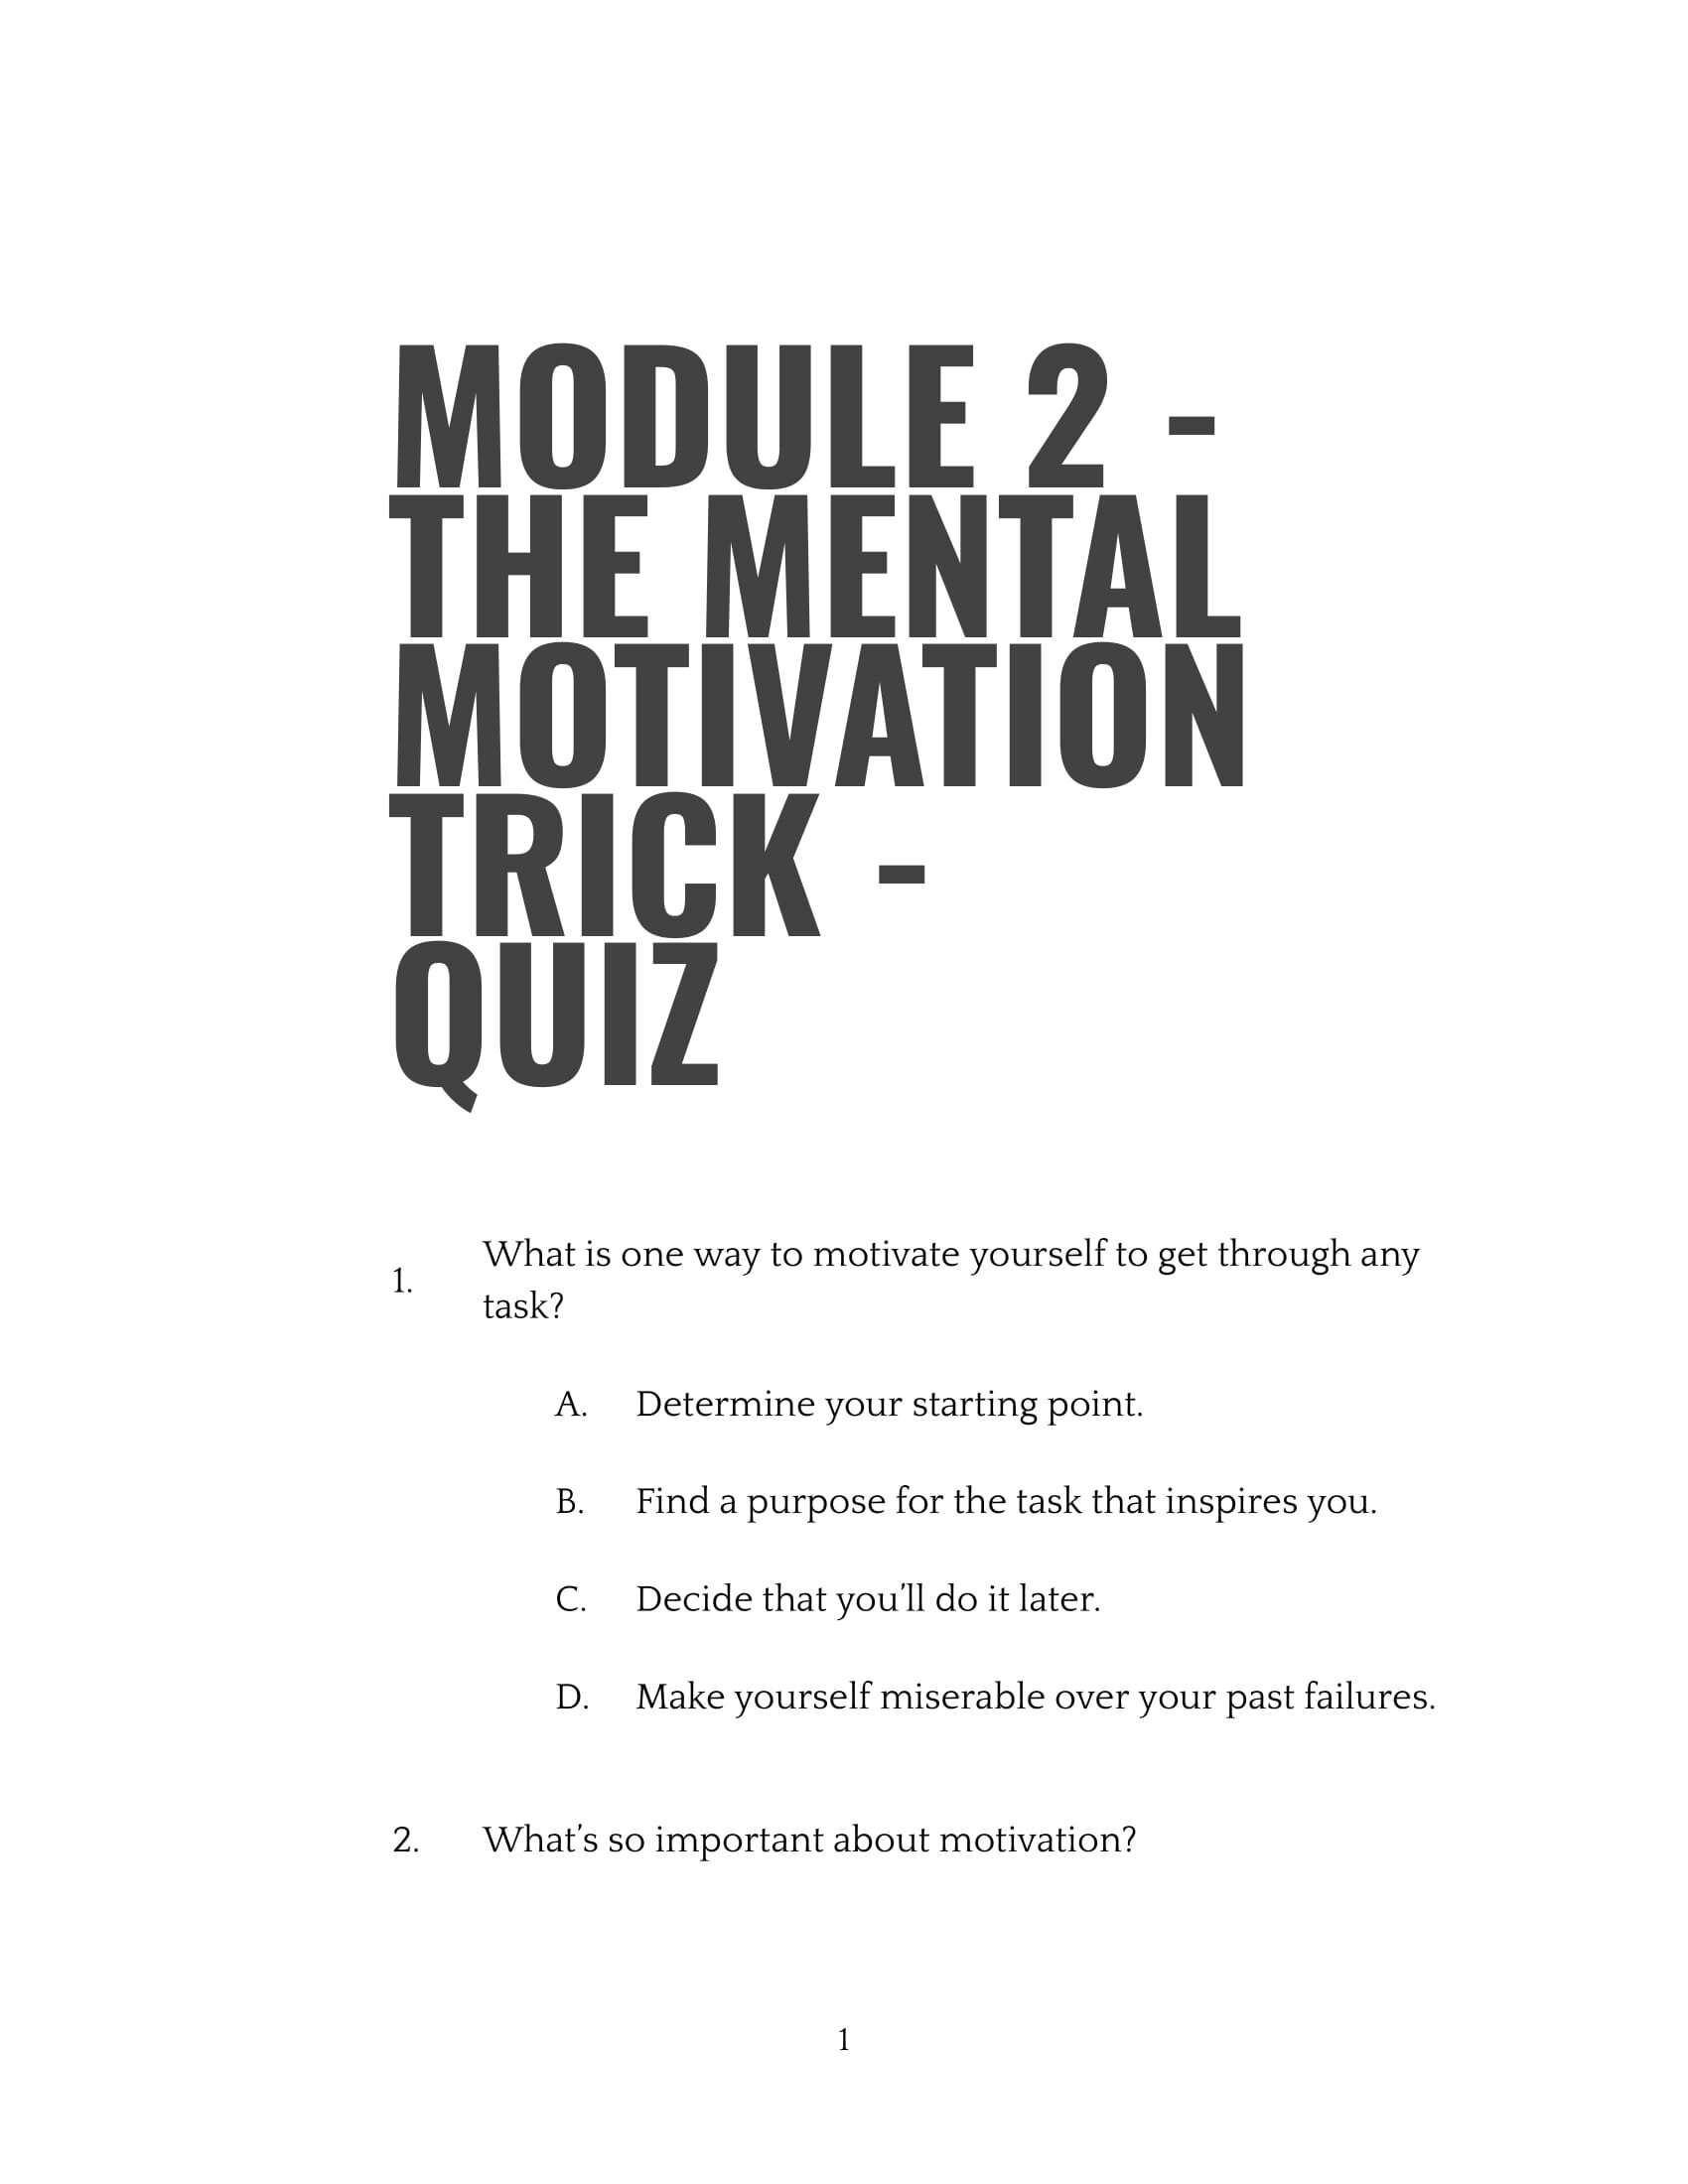 Module 2 - The Mental Motivation Trick - Quiz-1.jpg